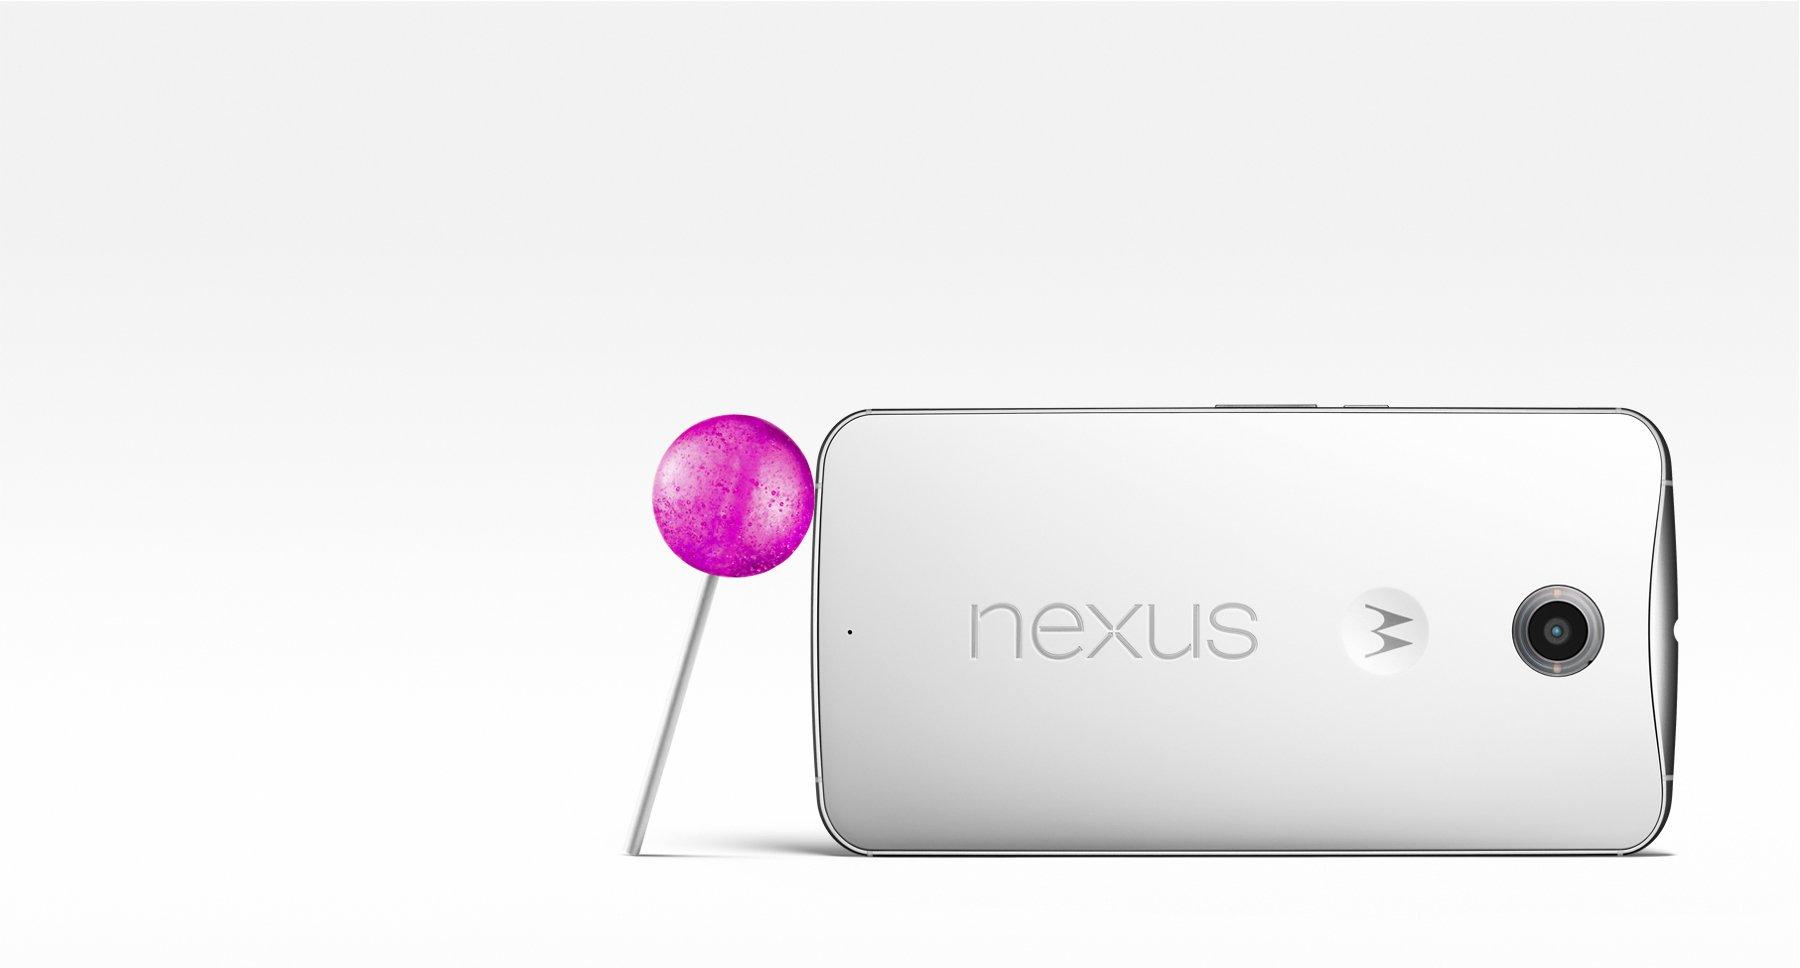 Google Unveils Nexus 6 With Lollipop